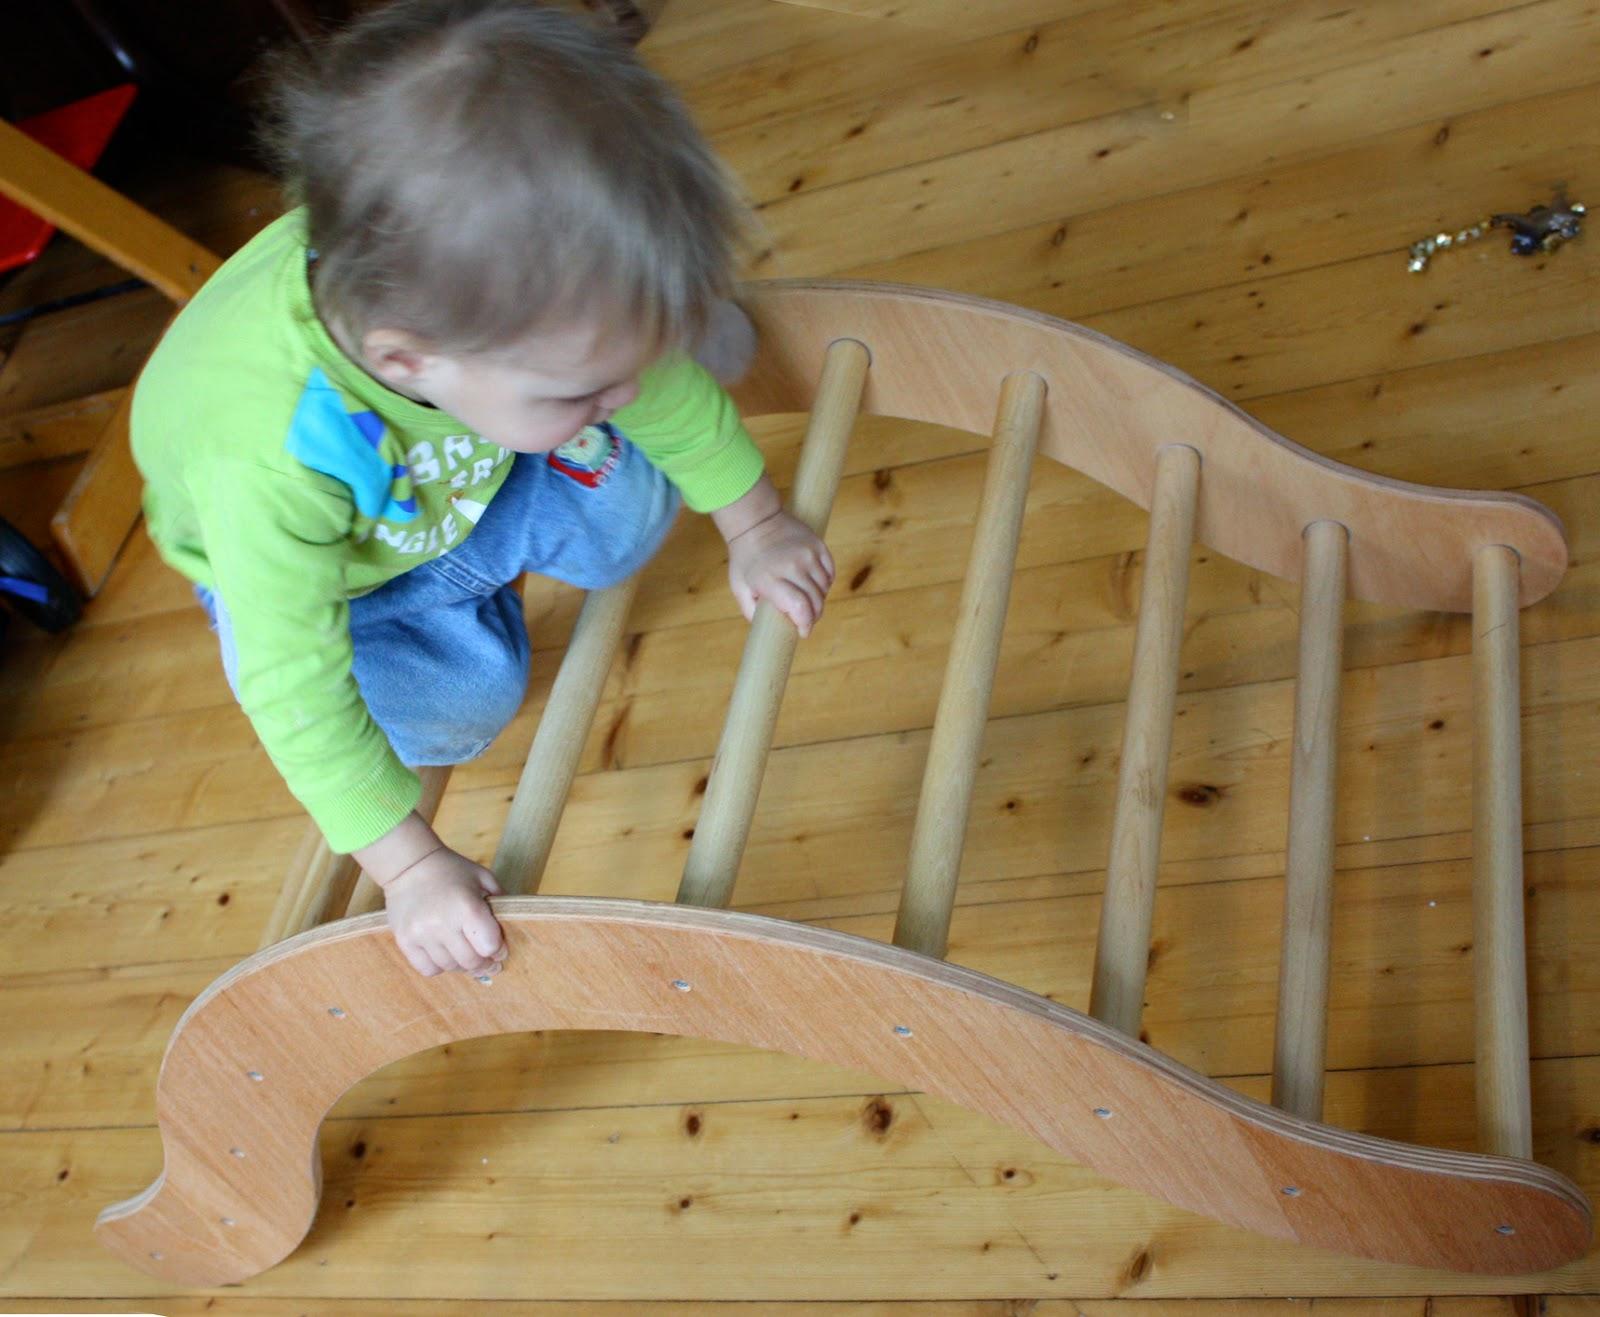 Kletterbogen Garten : Mutterfreu n de kletterbogen fürs kletterkind